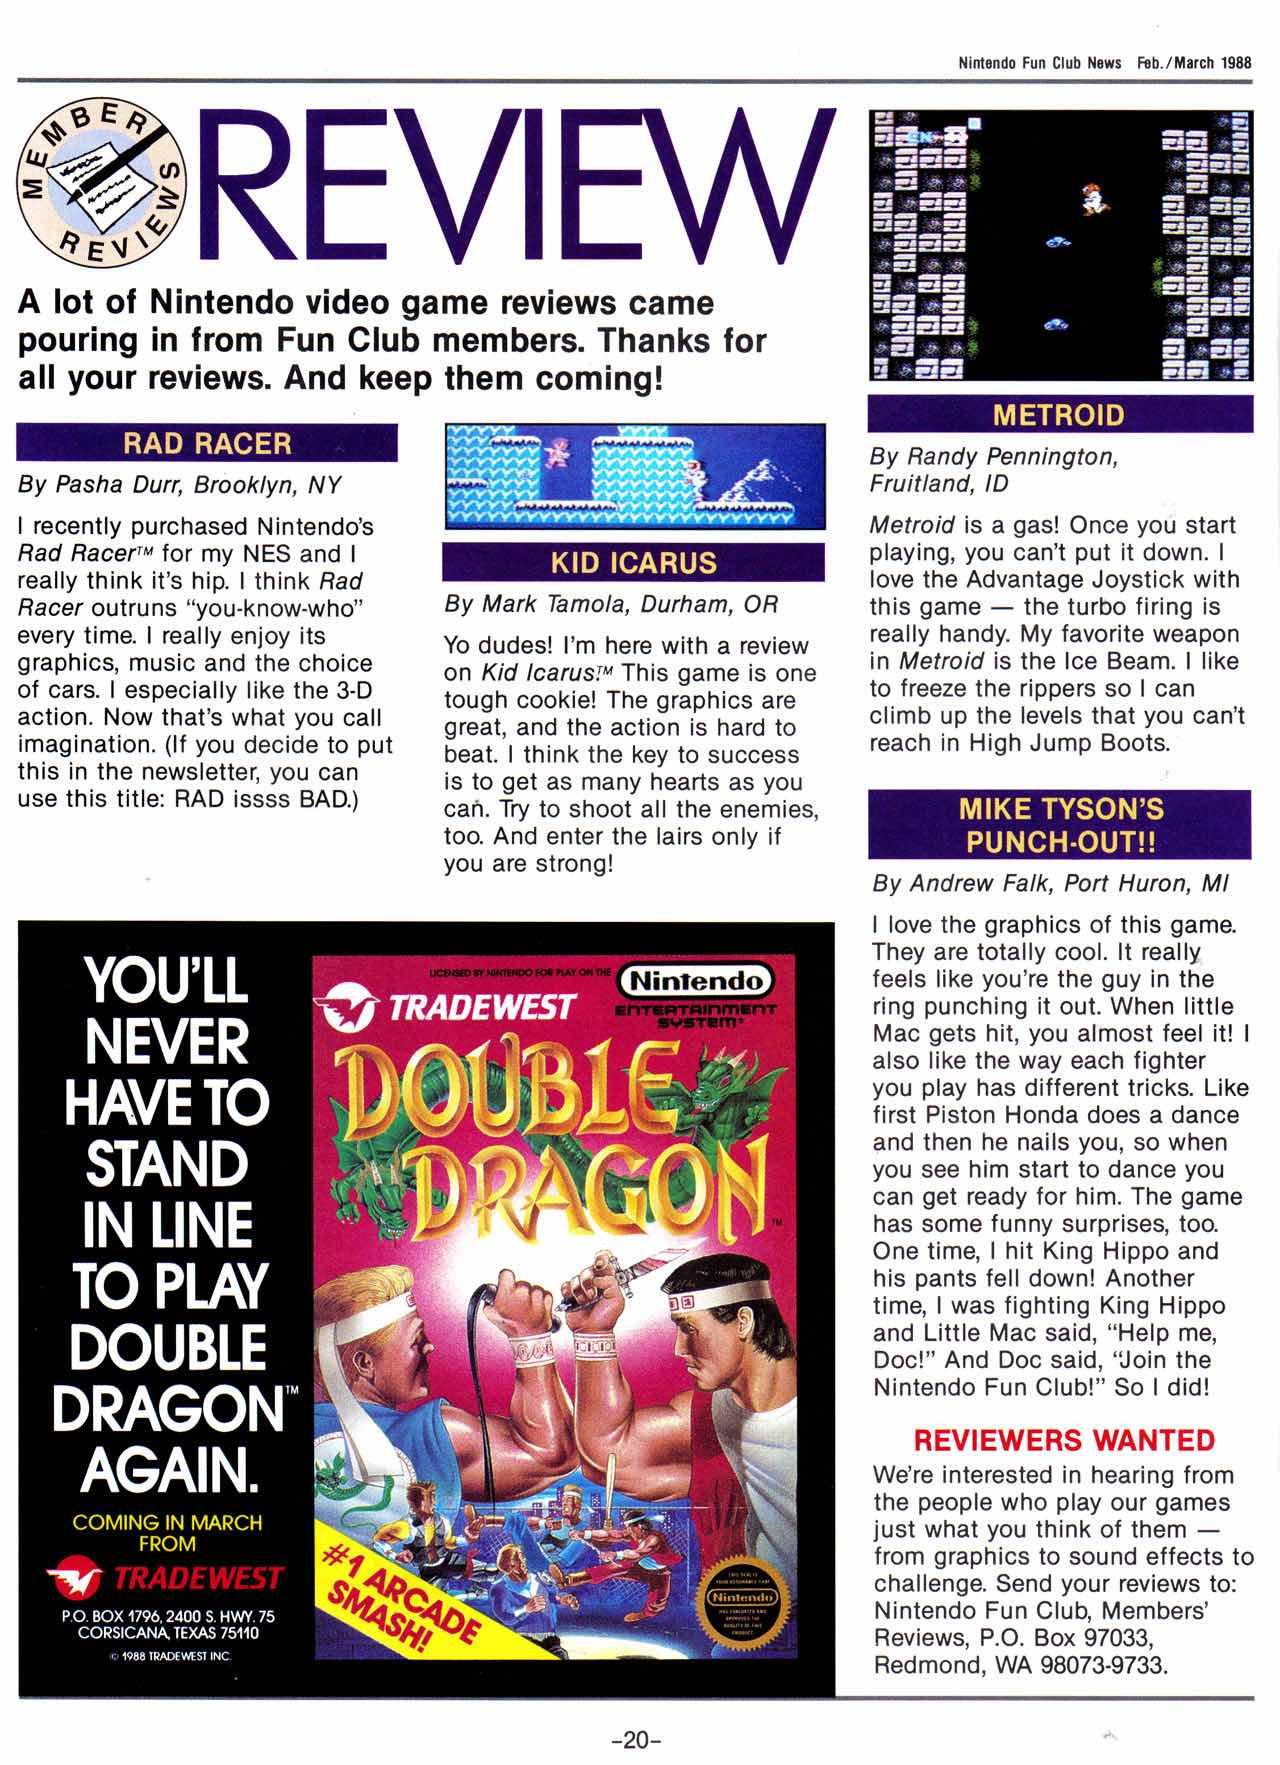 Nintendo Fun Club News | Feb-Mar 1988 Member Reviews